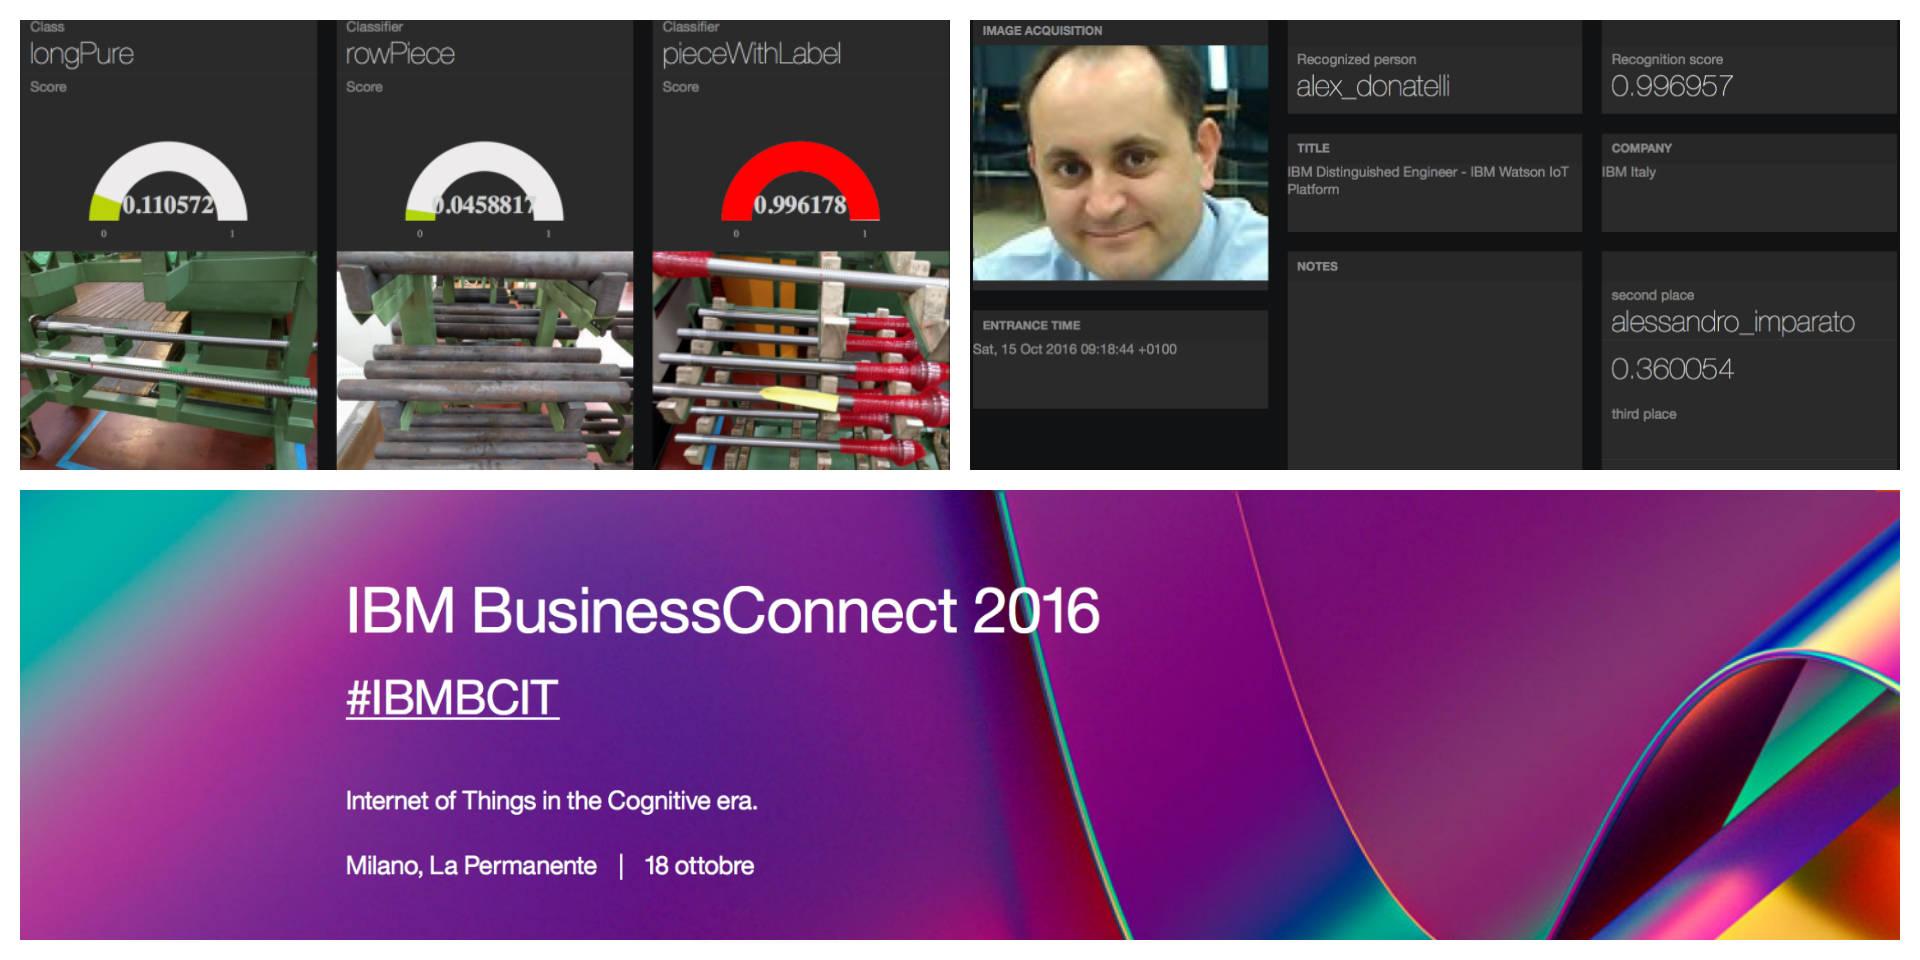 ibm businessconnect 2016